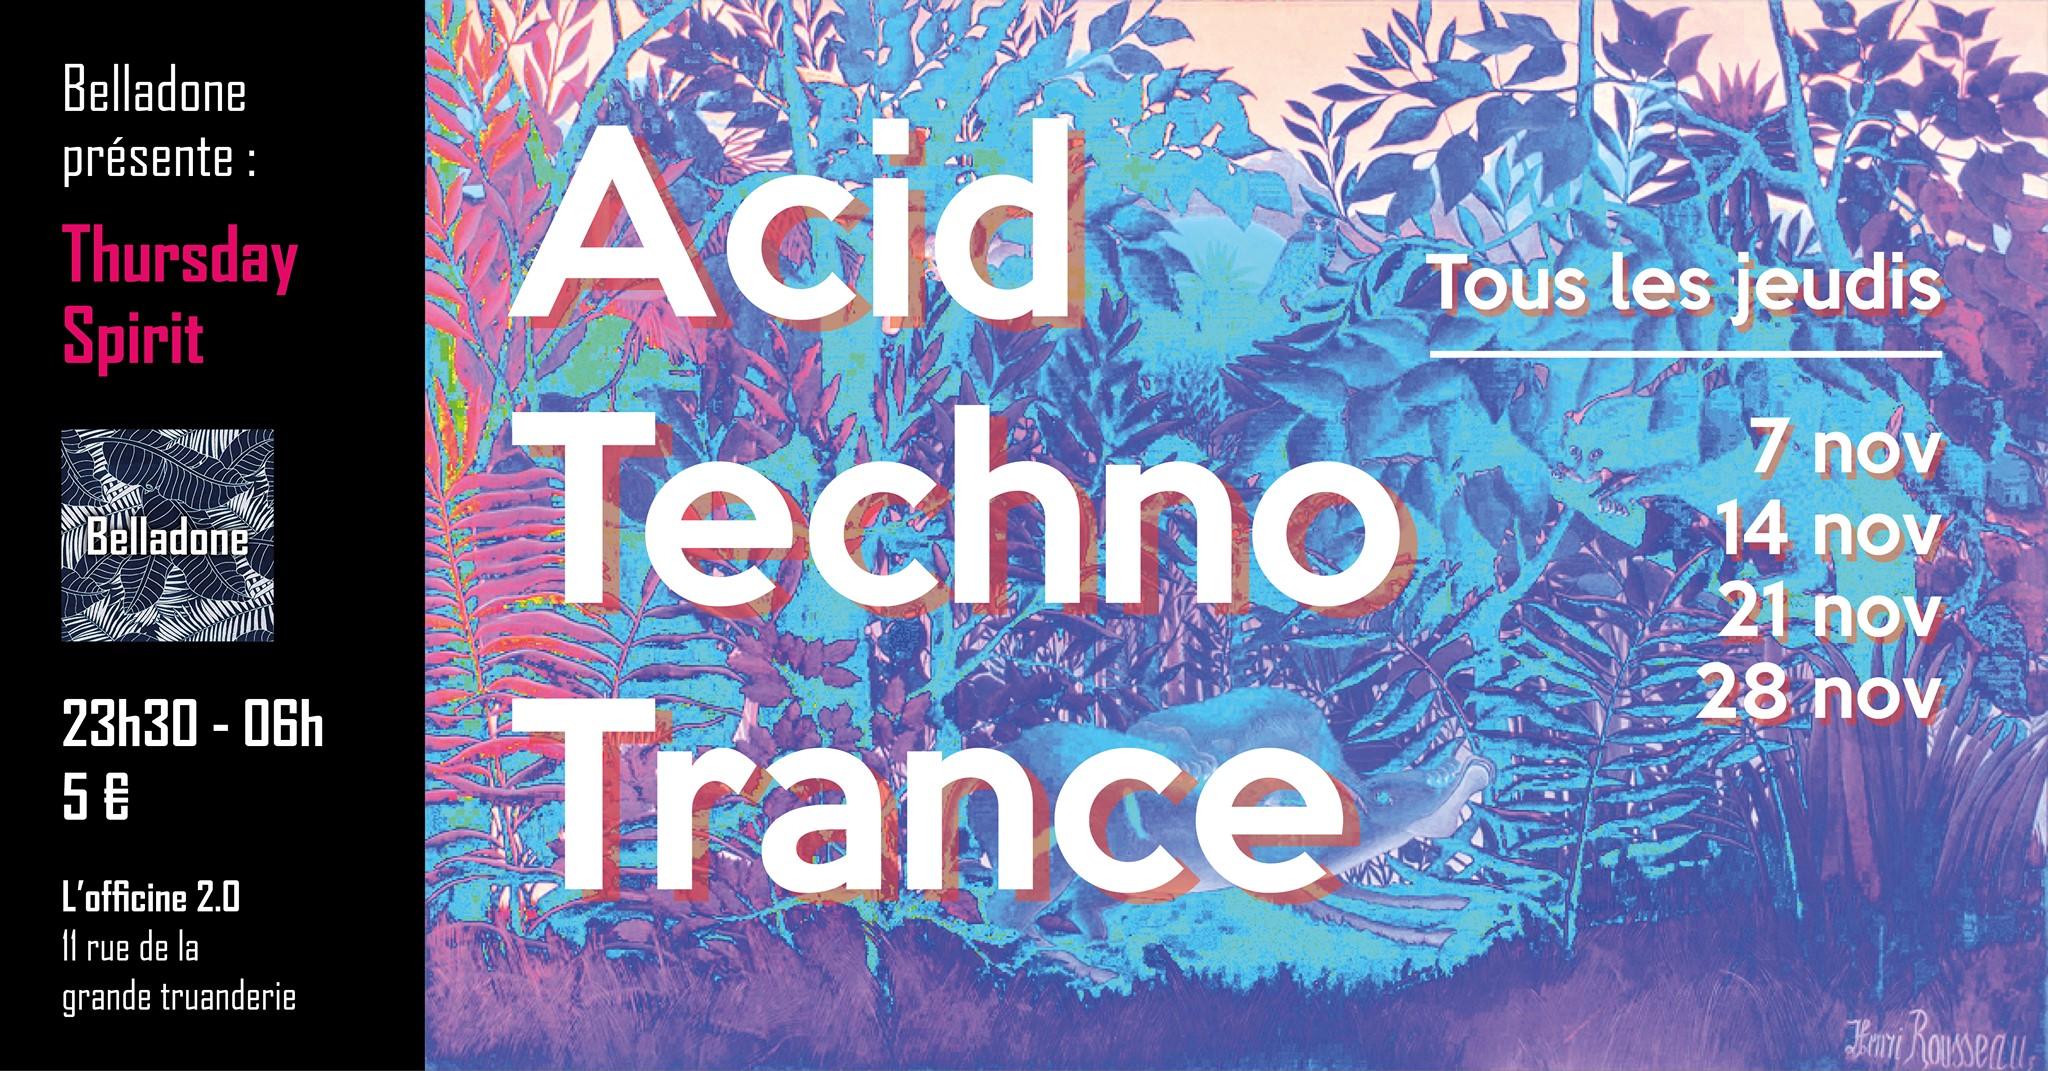 Thursday Spirit : Techno to Trance